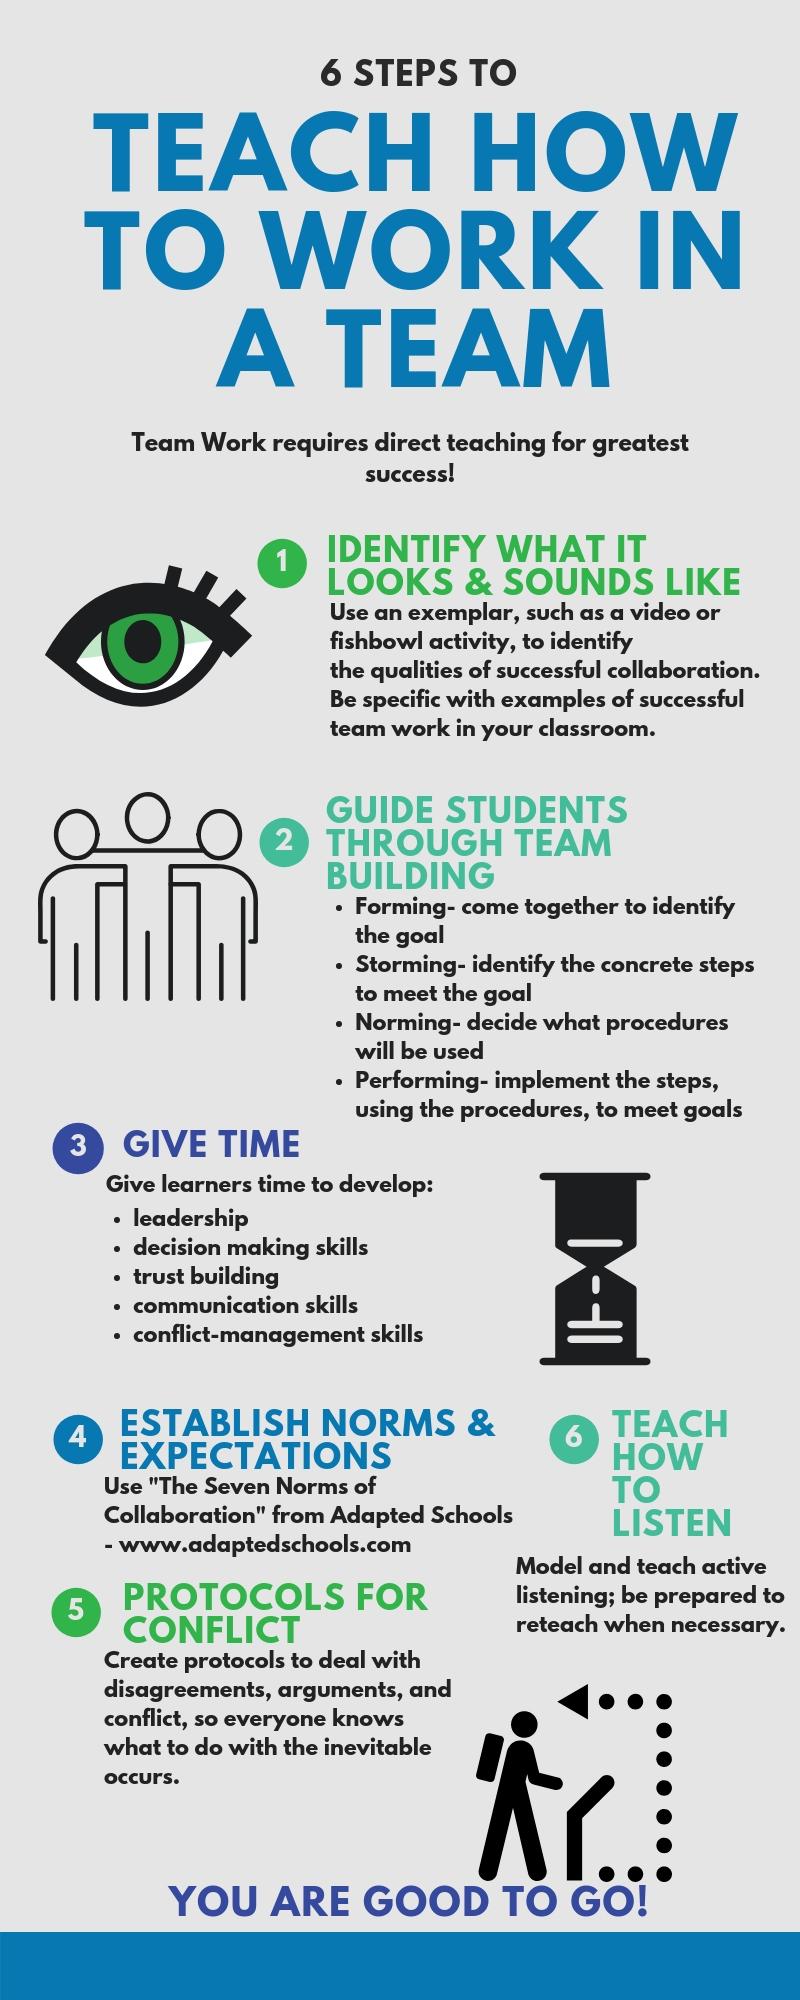 Teach how to work in a team (1).jpg